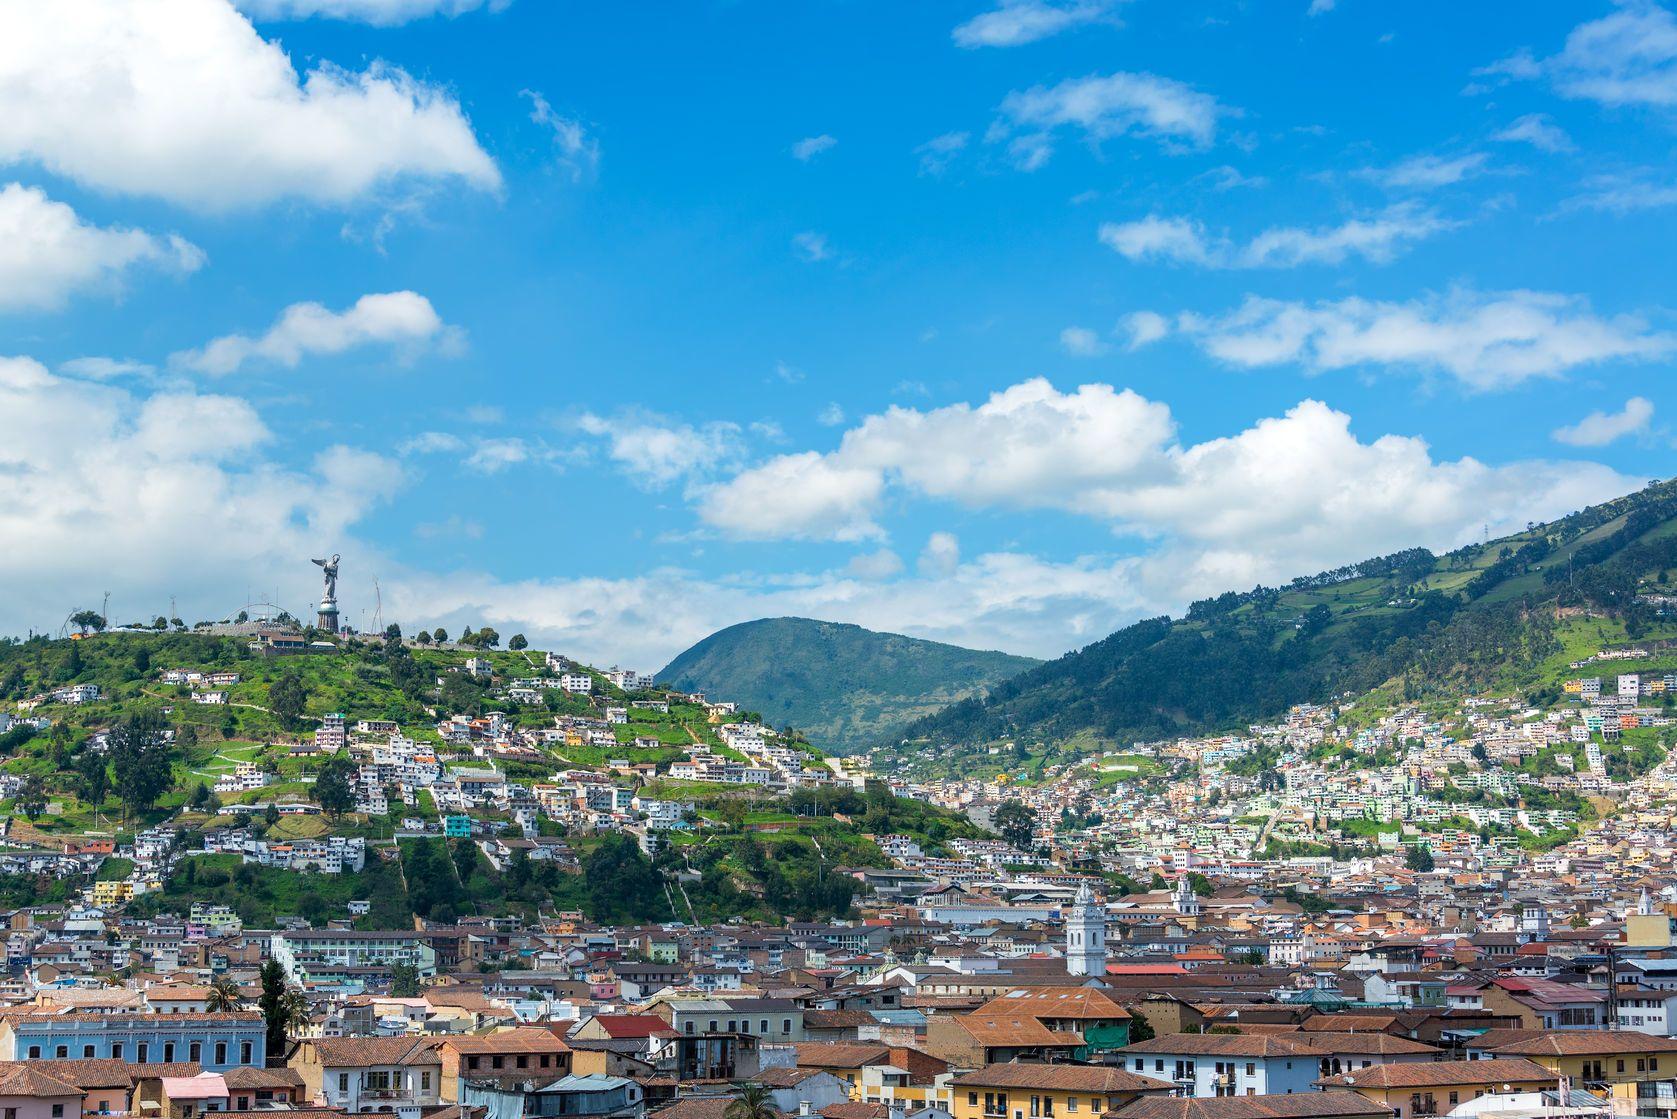 Pohled na Quito v Ekvádoru | jkraft5/123RF.com